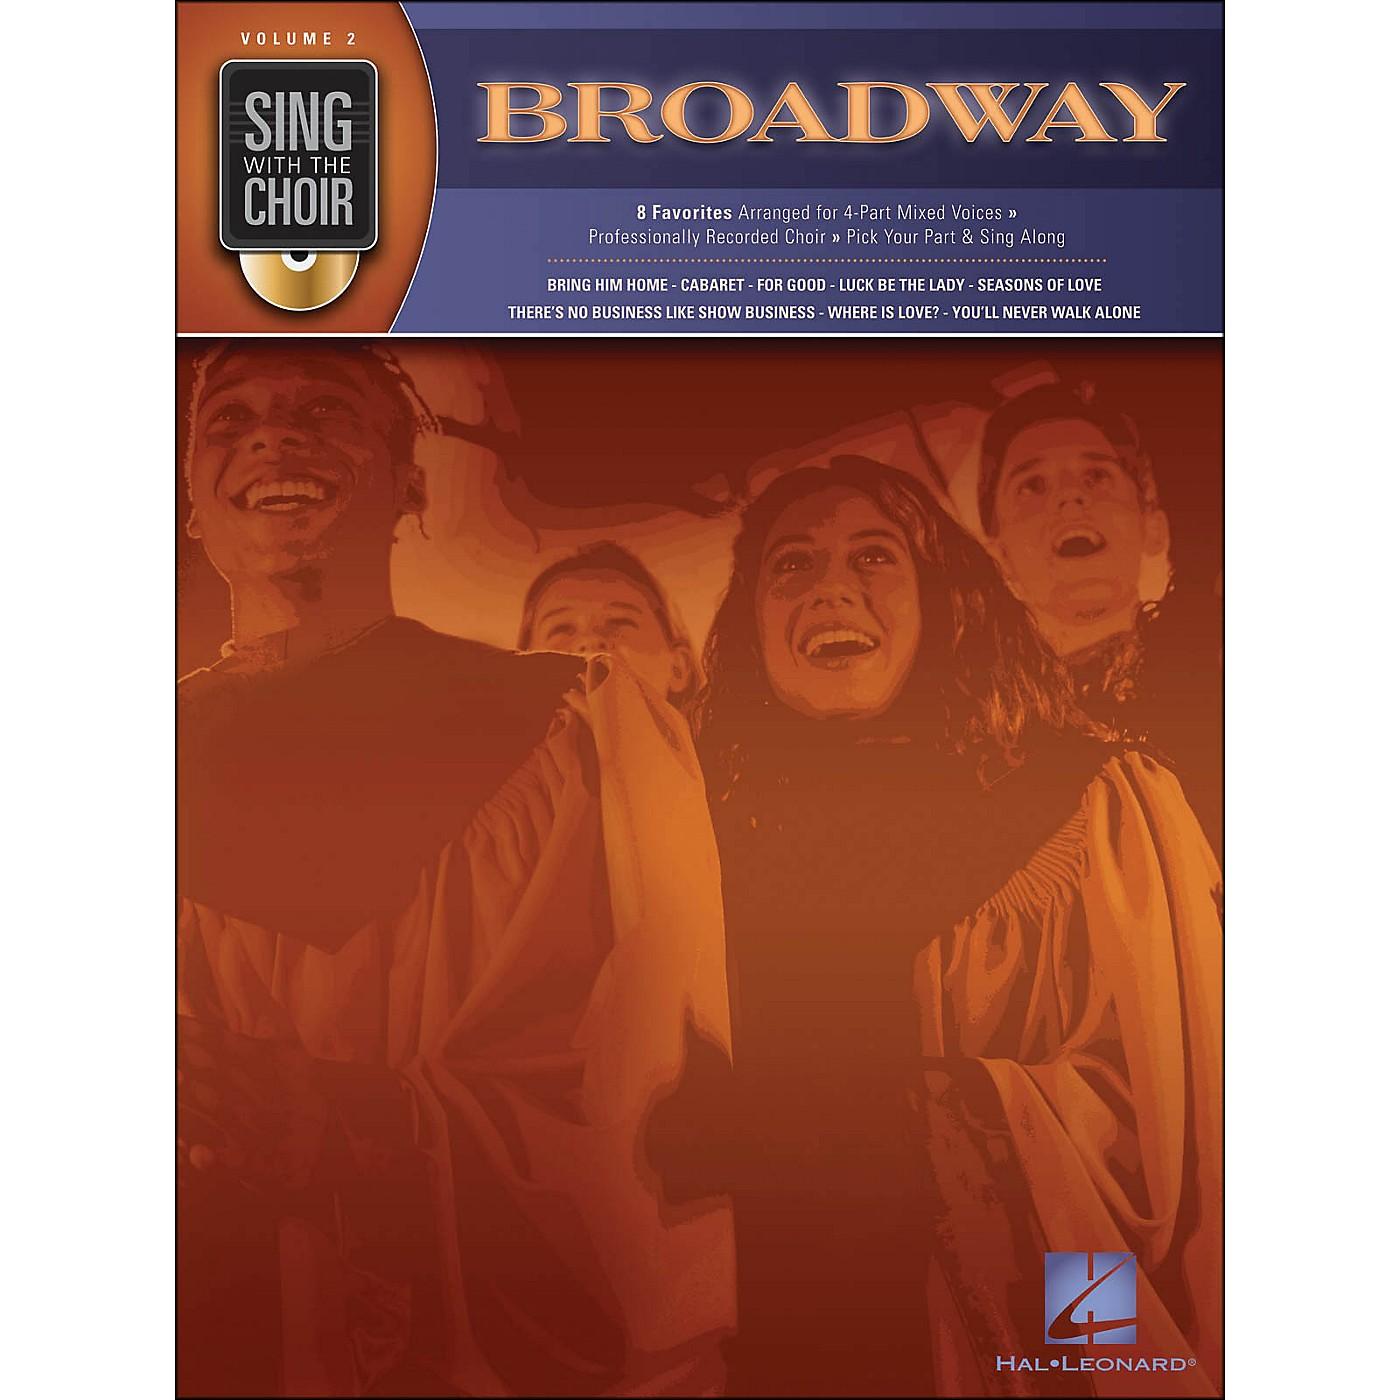 Hal Leonard Broadway - Sing with The Choir Series Volume 2 Book/CD thumbnail